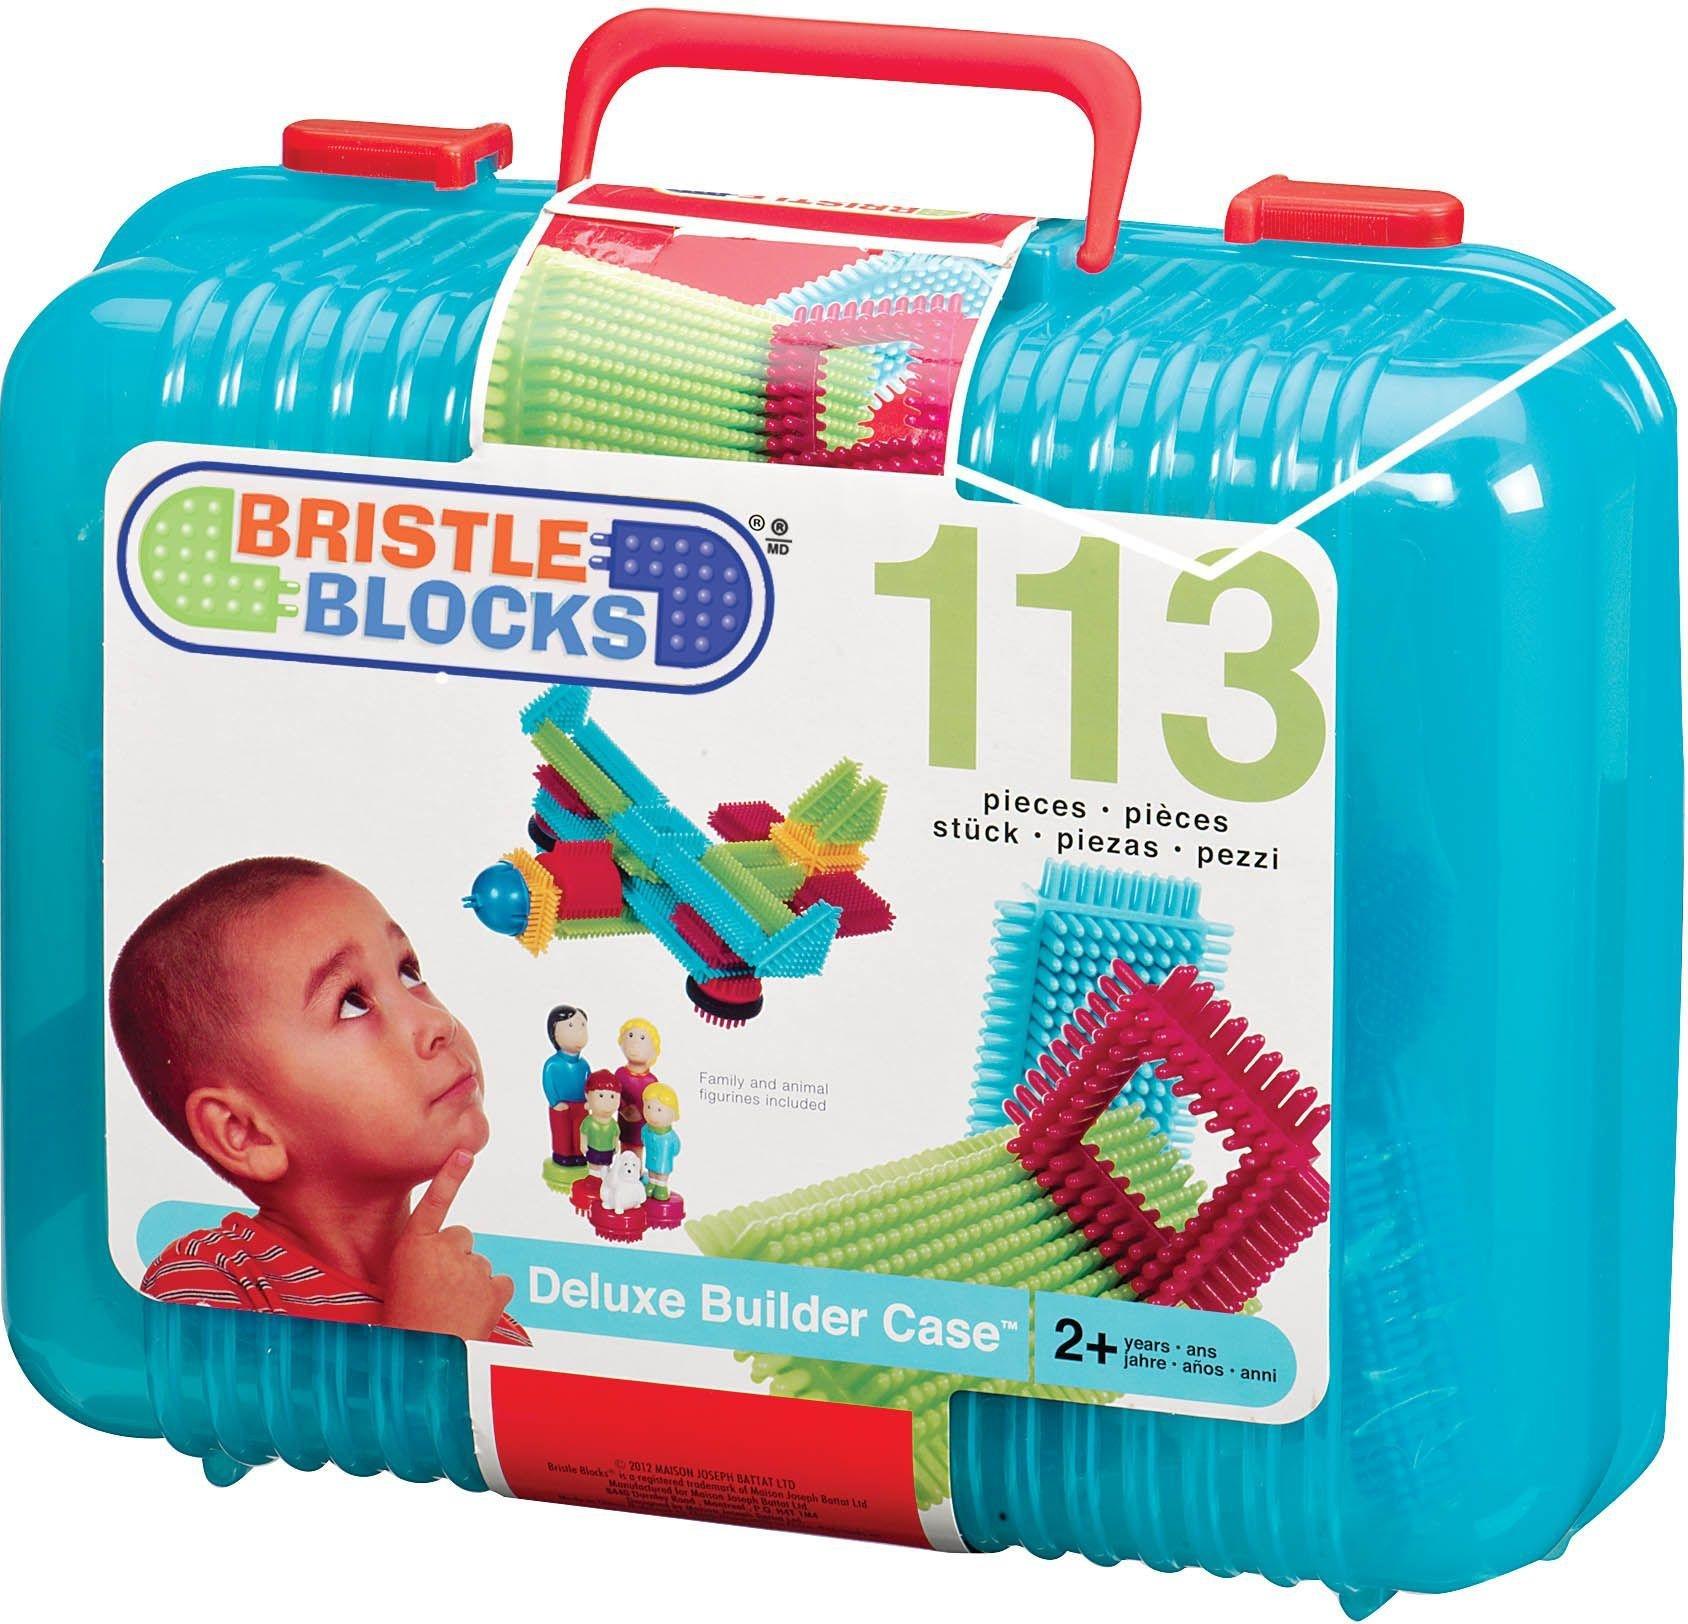 Image of Bristle Blocks Deluxe Builder Case - 113 Pieces.